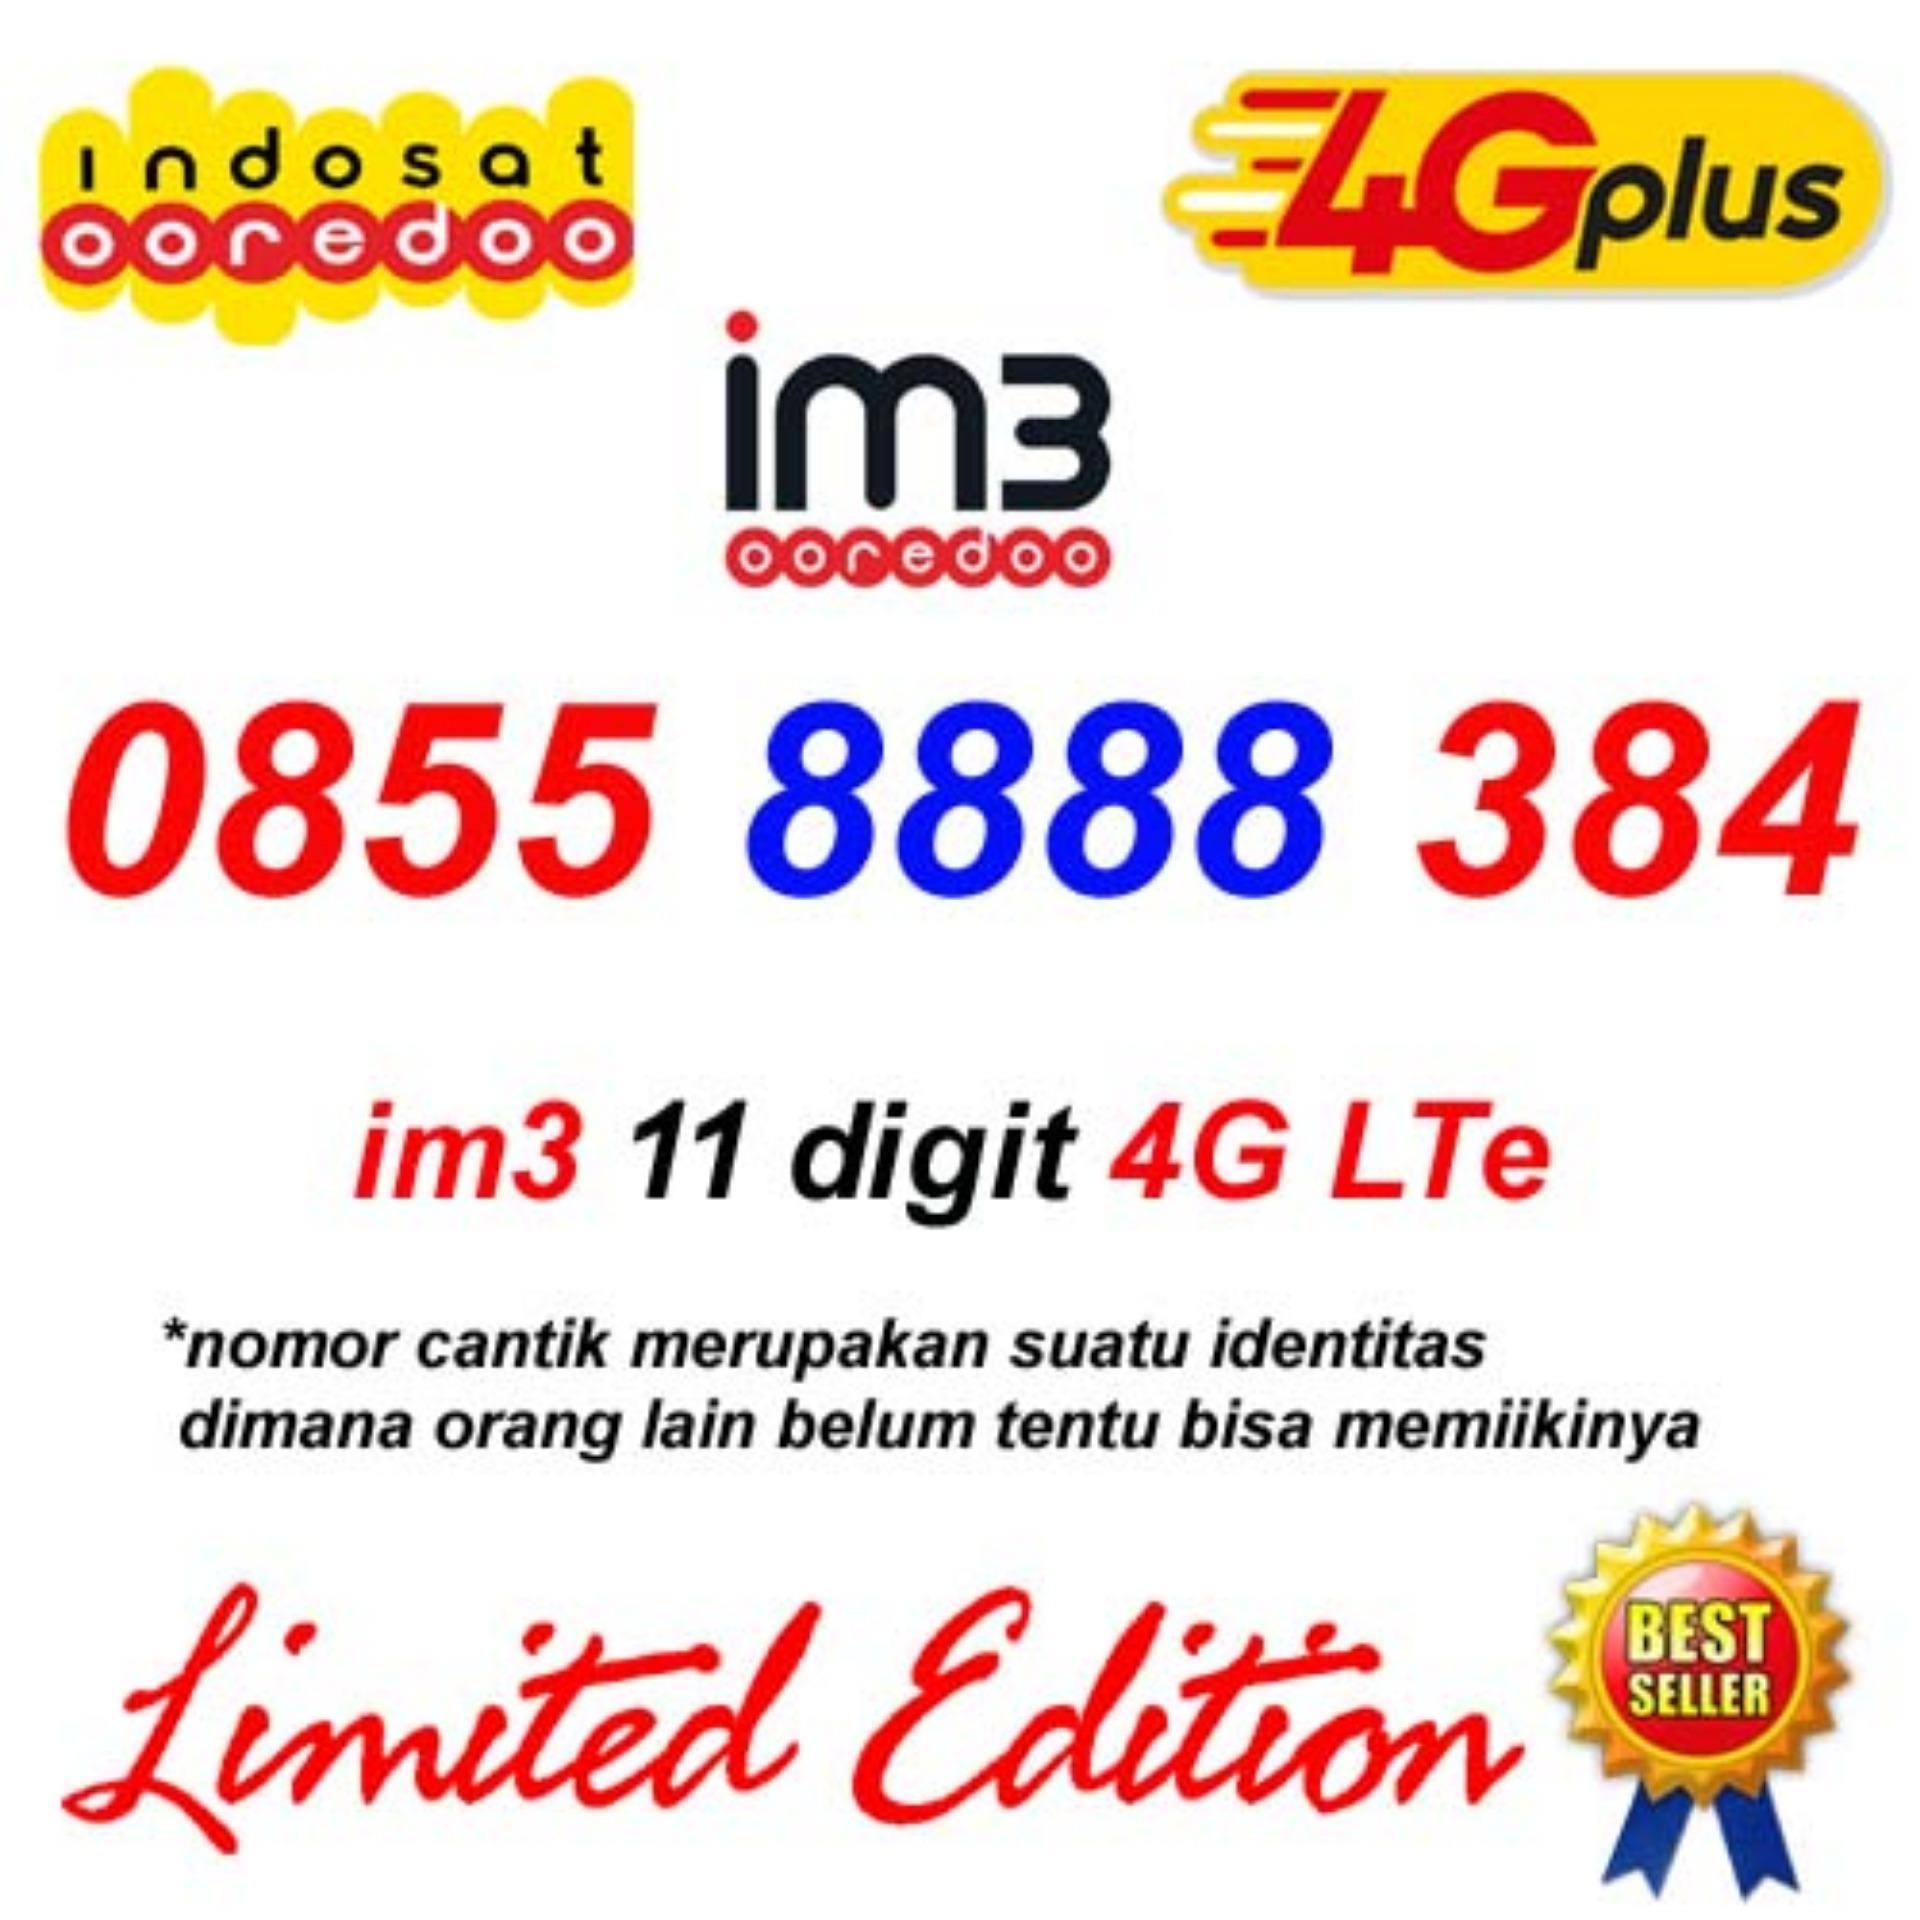 Indosat Im3 11 Digit 0855 888 8384 Kartu Perdana Nomor Cantik Ooredoo 4G .